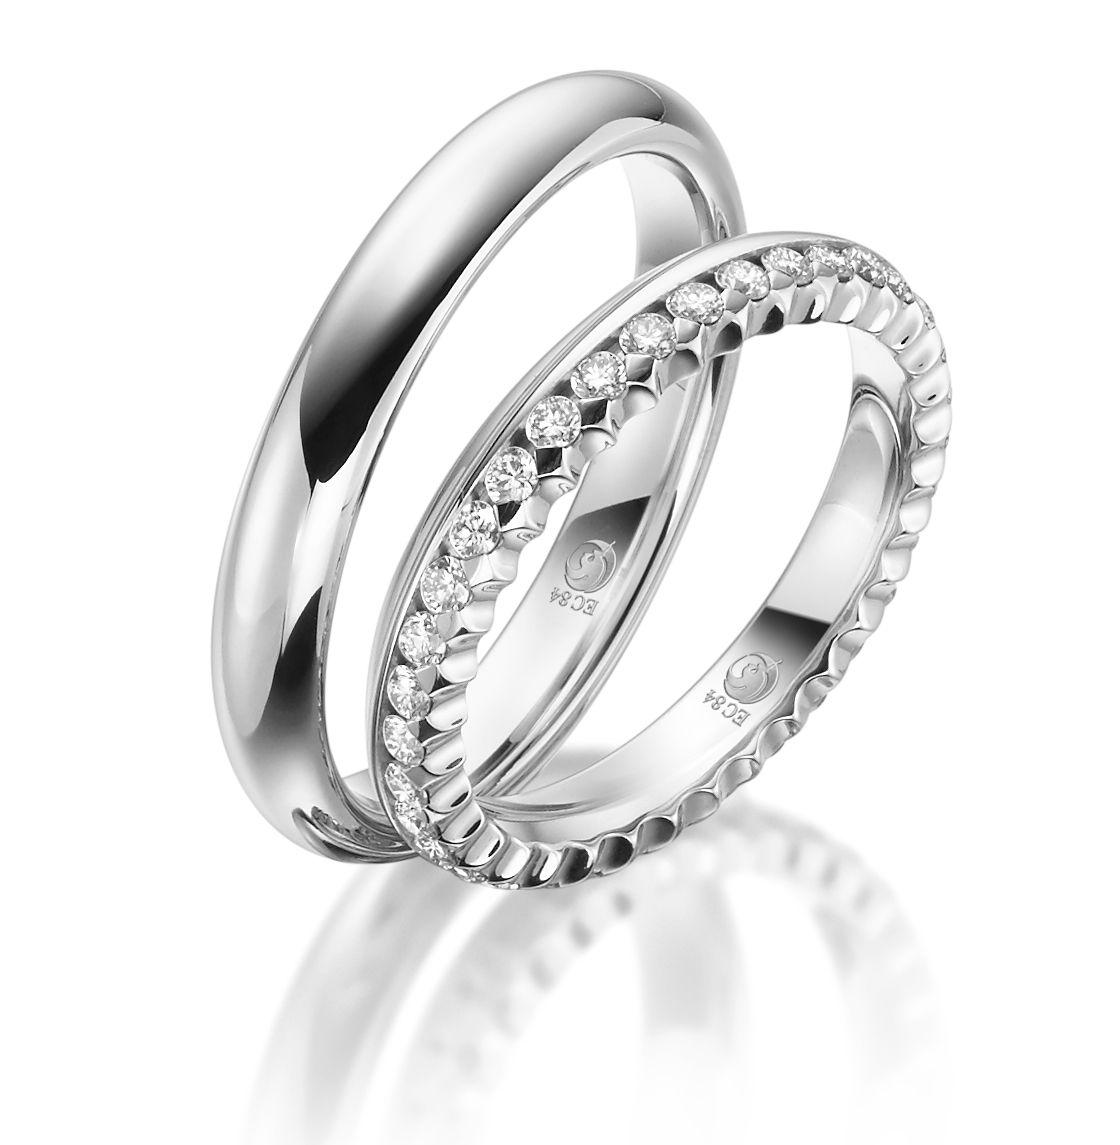 27 Ausgefallene Trauringe Ideen Trauringe Eheringe Ring Verlobung